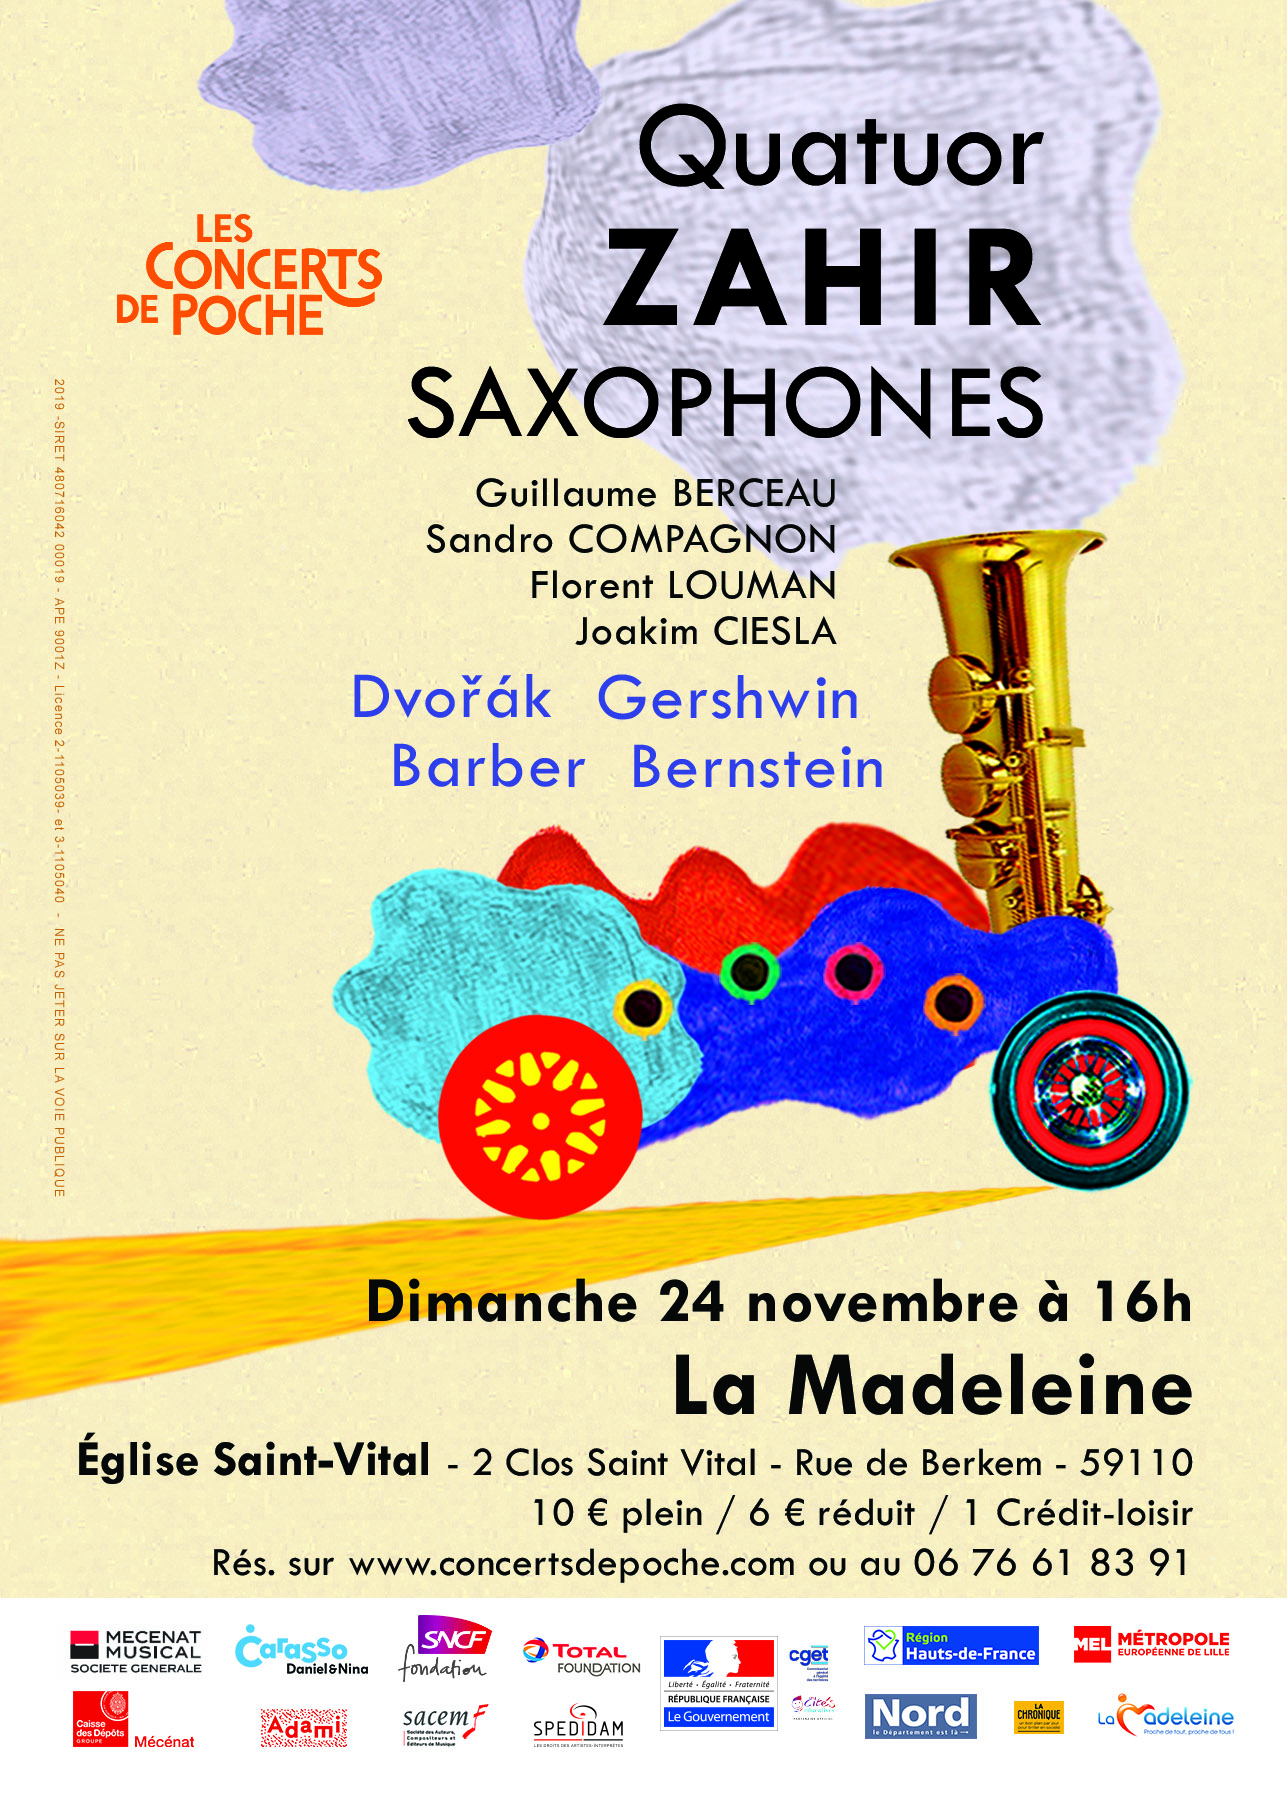 Quatuor Zahir, virtuoses du saxophone